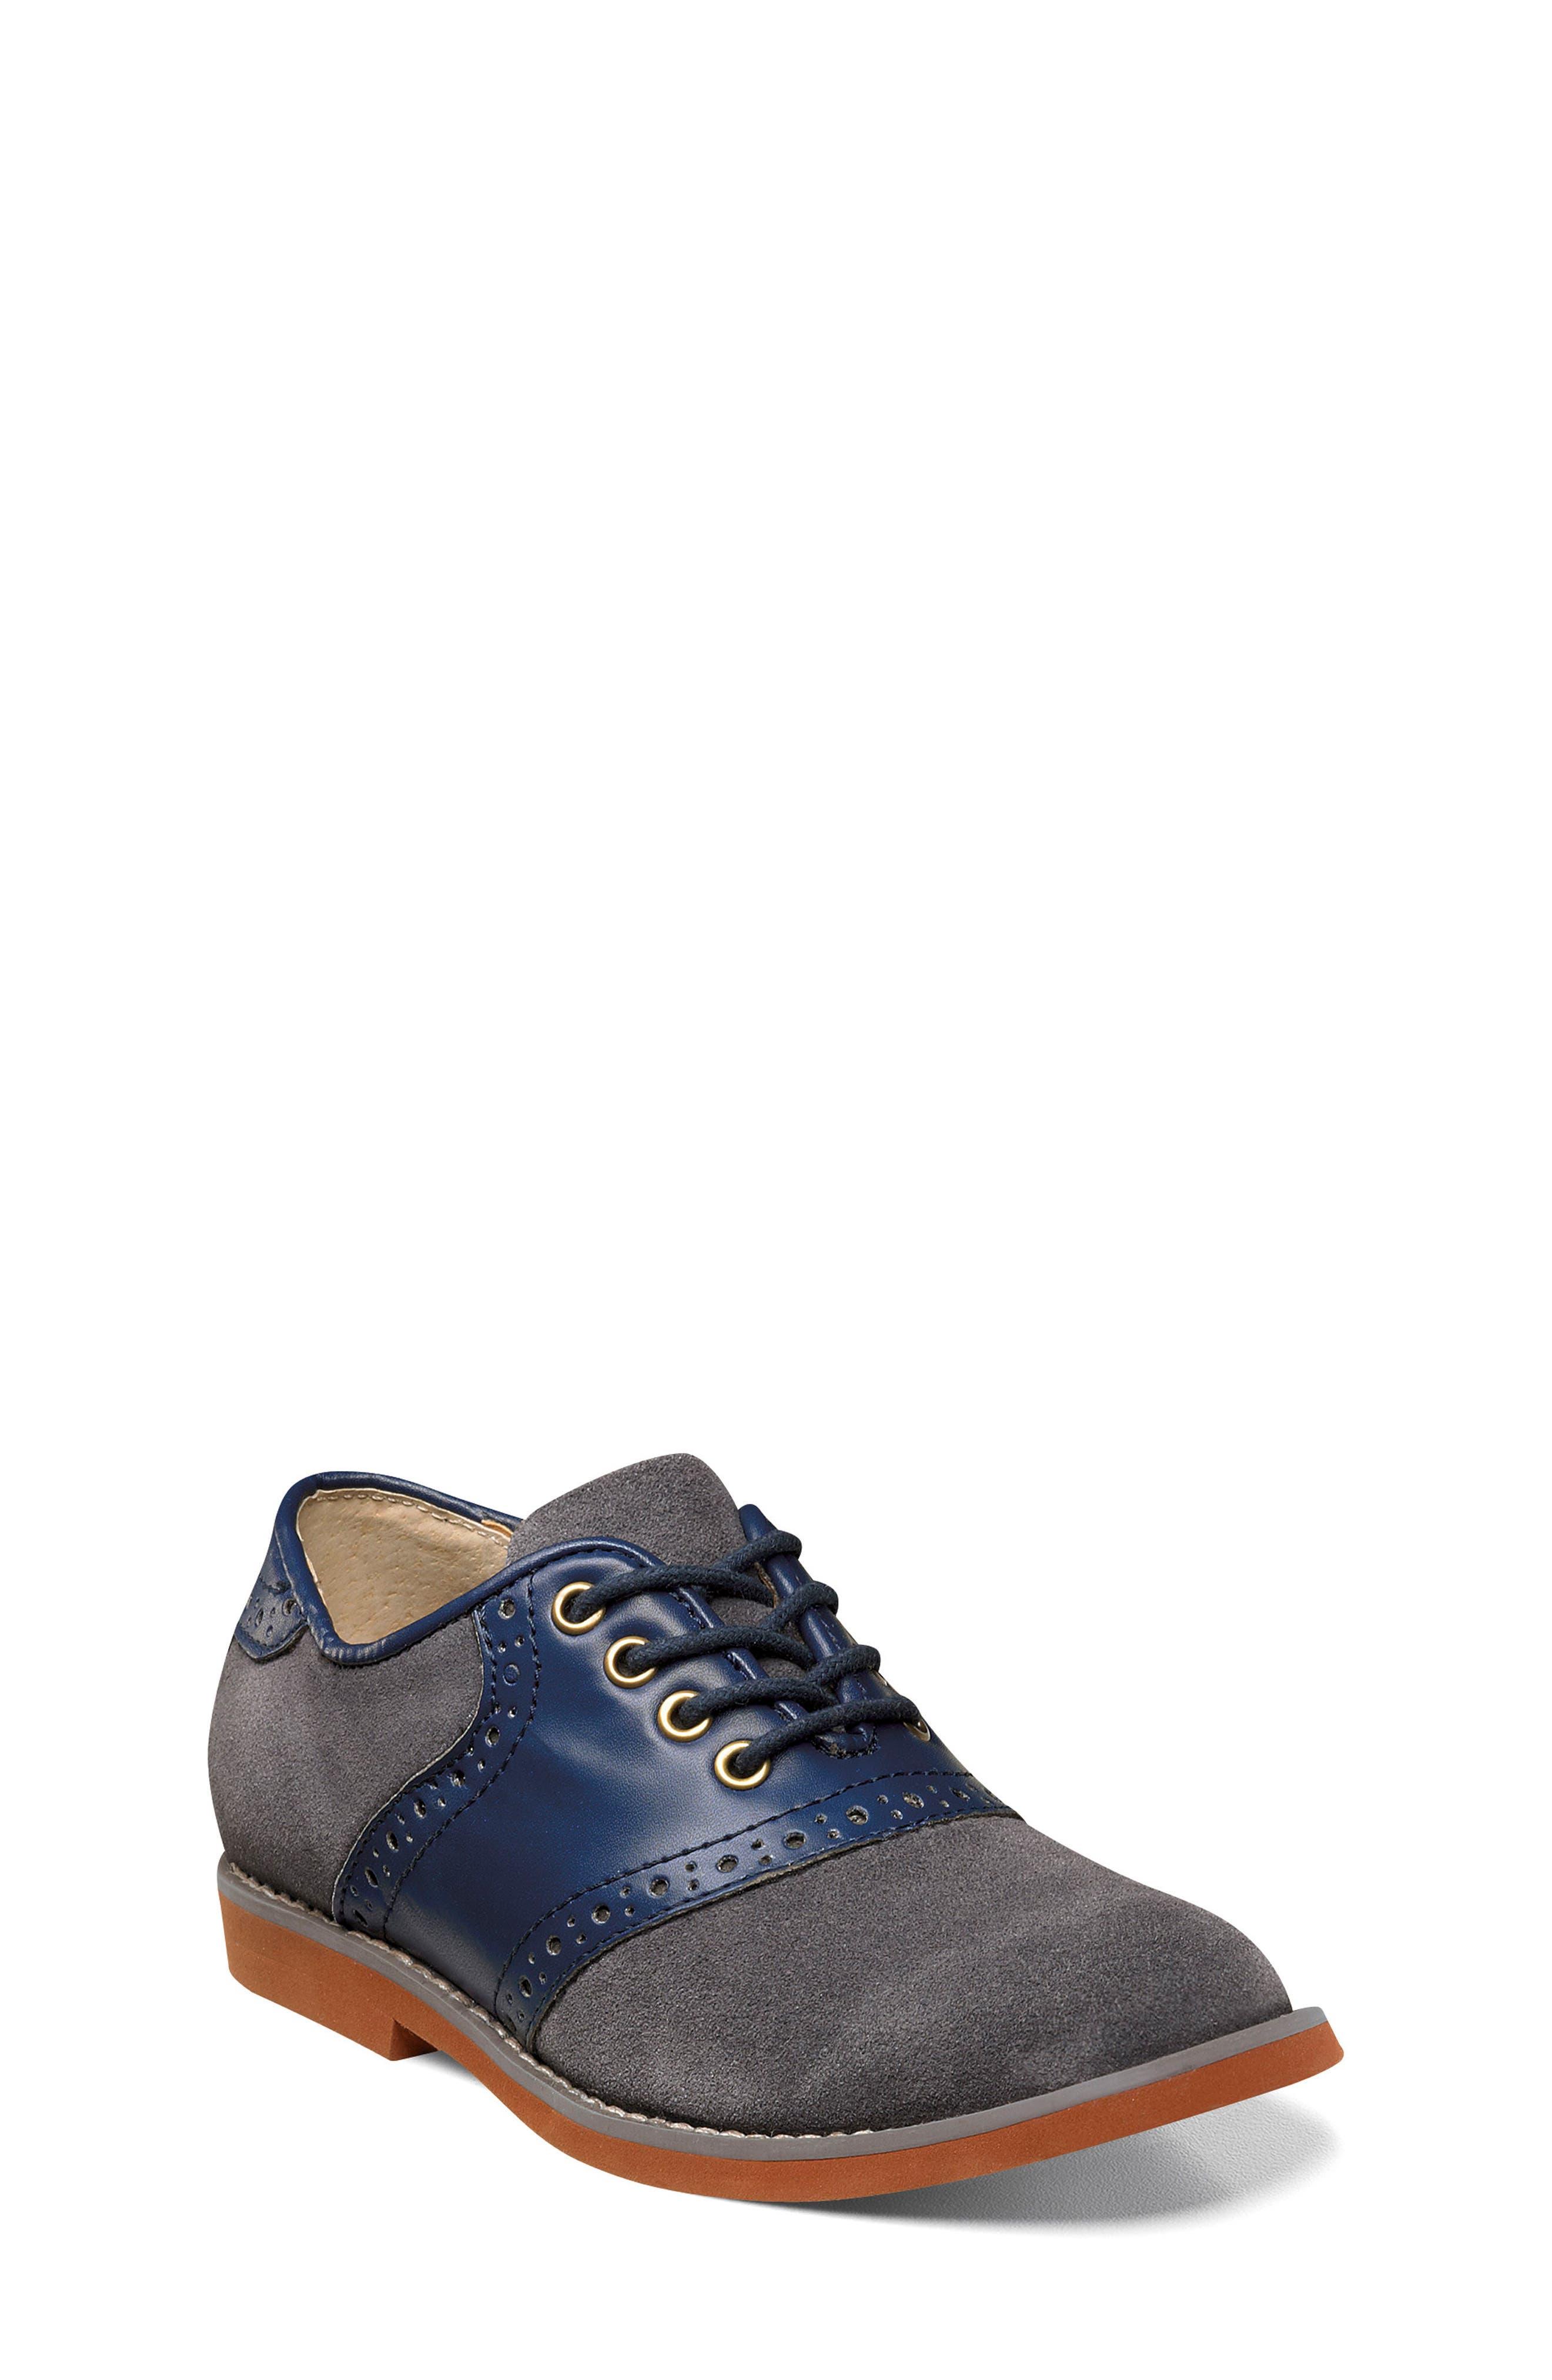 Boys Florsheim Kennett Oxford Size 4 M  Blue